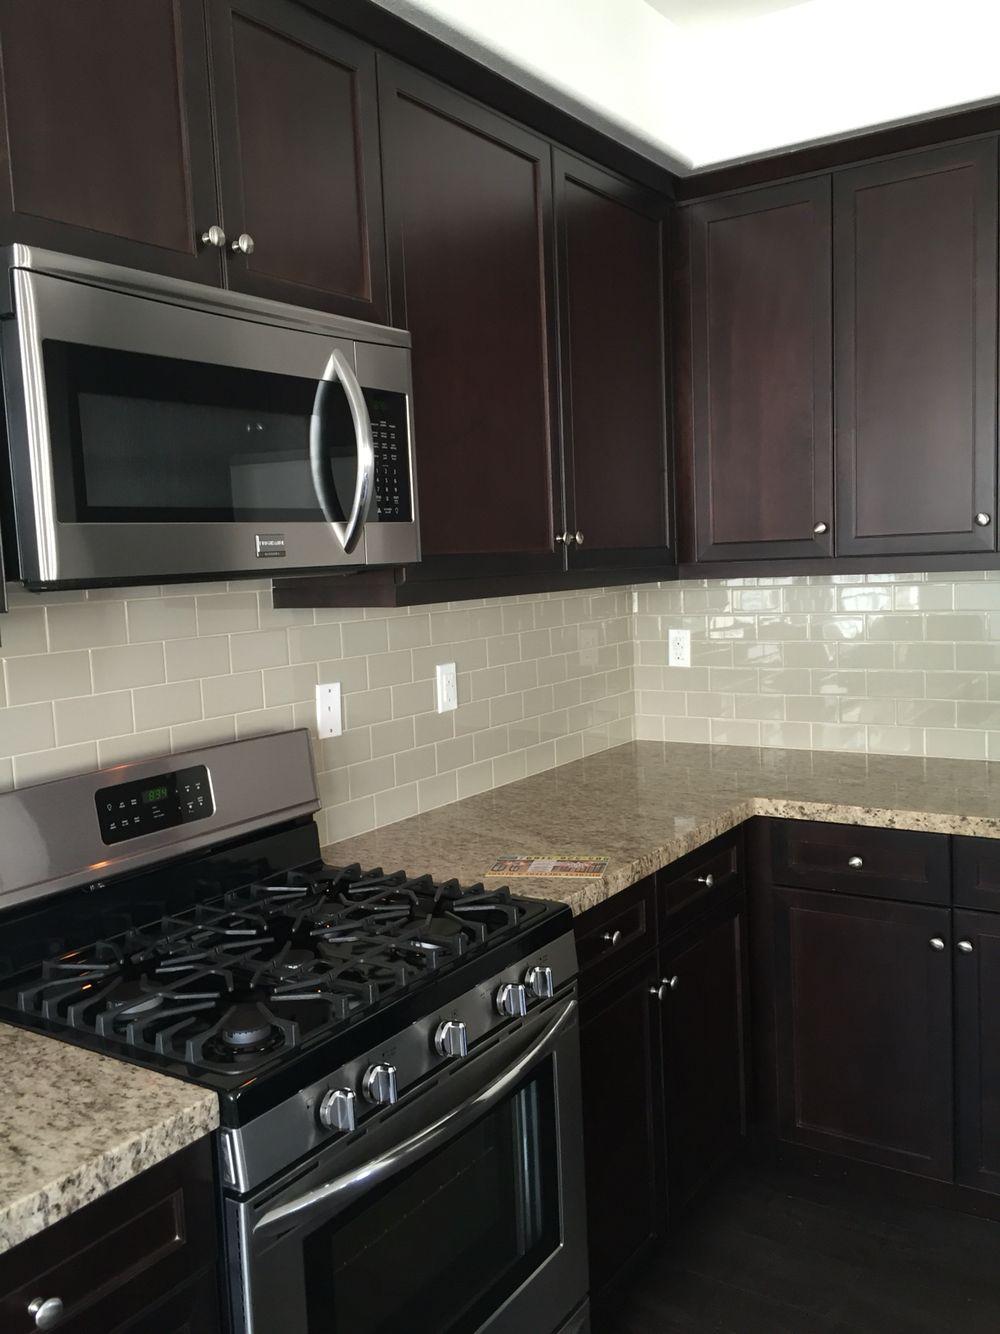 Dark color kitchens (With images)   Simple kitchen remodel ... on Backsplash Ideas For Dark Cabinets  id=89878